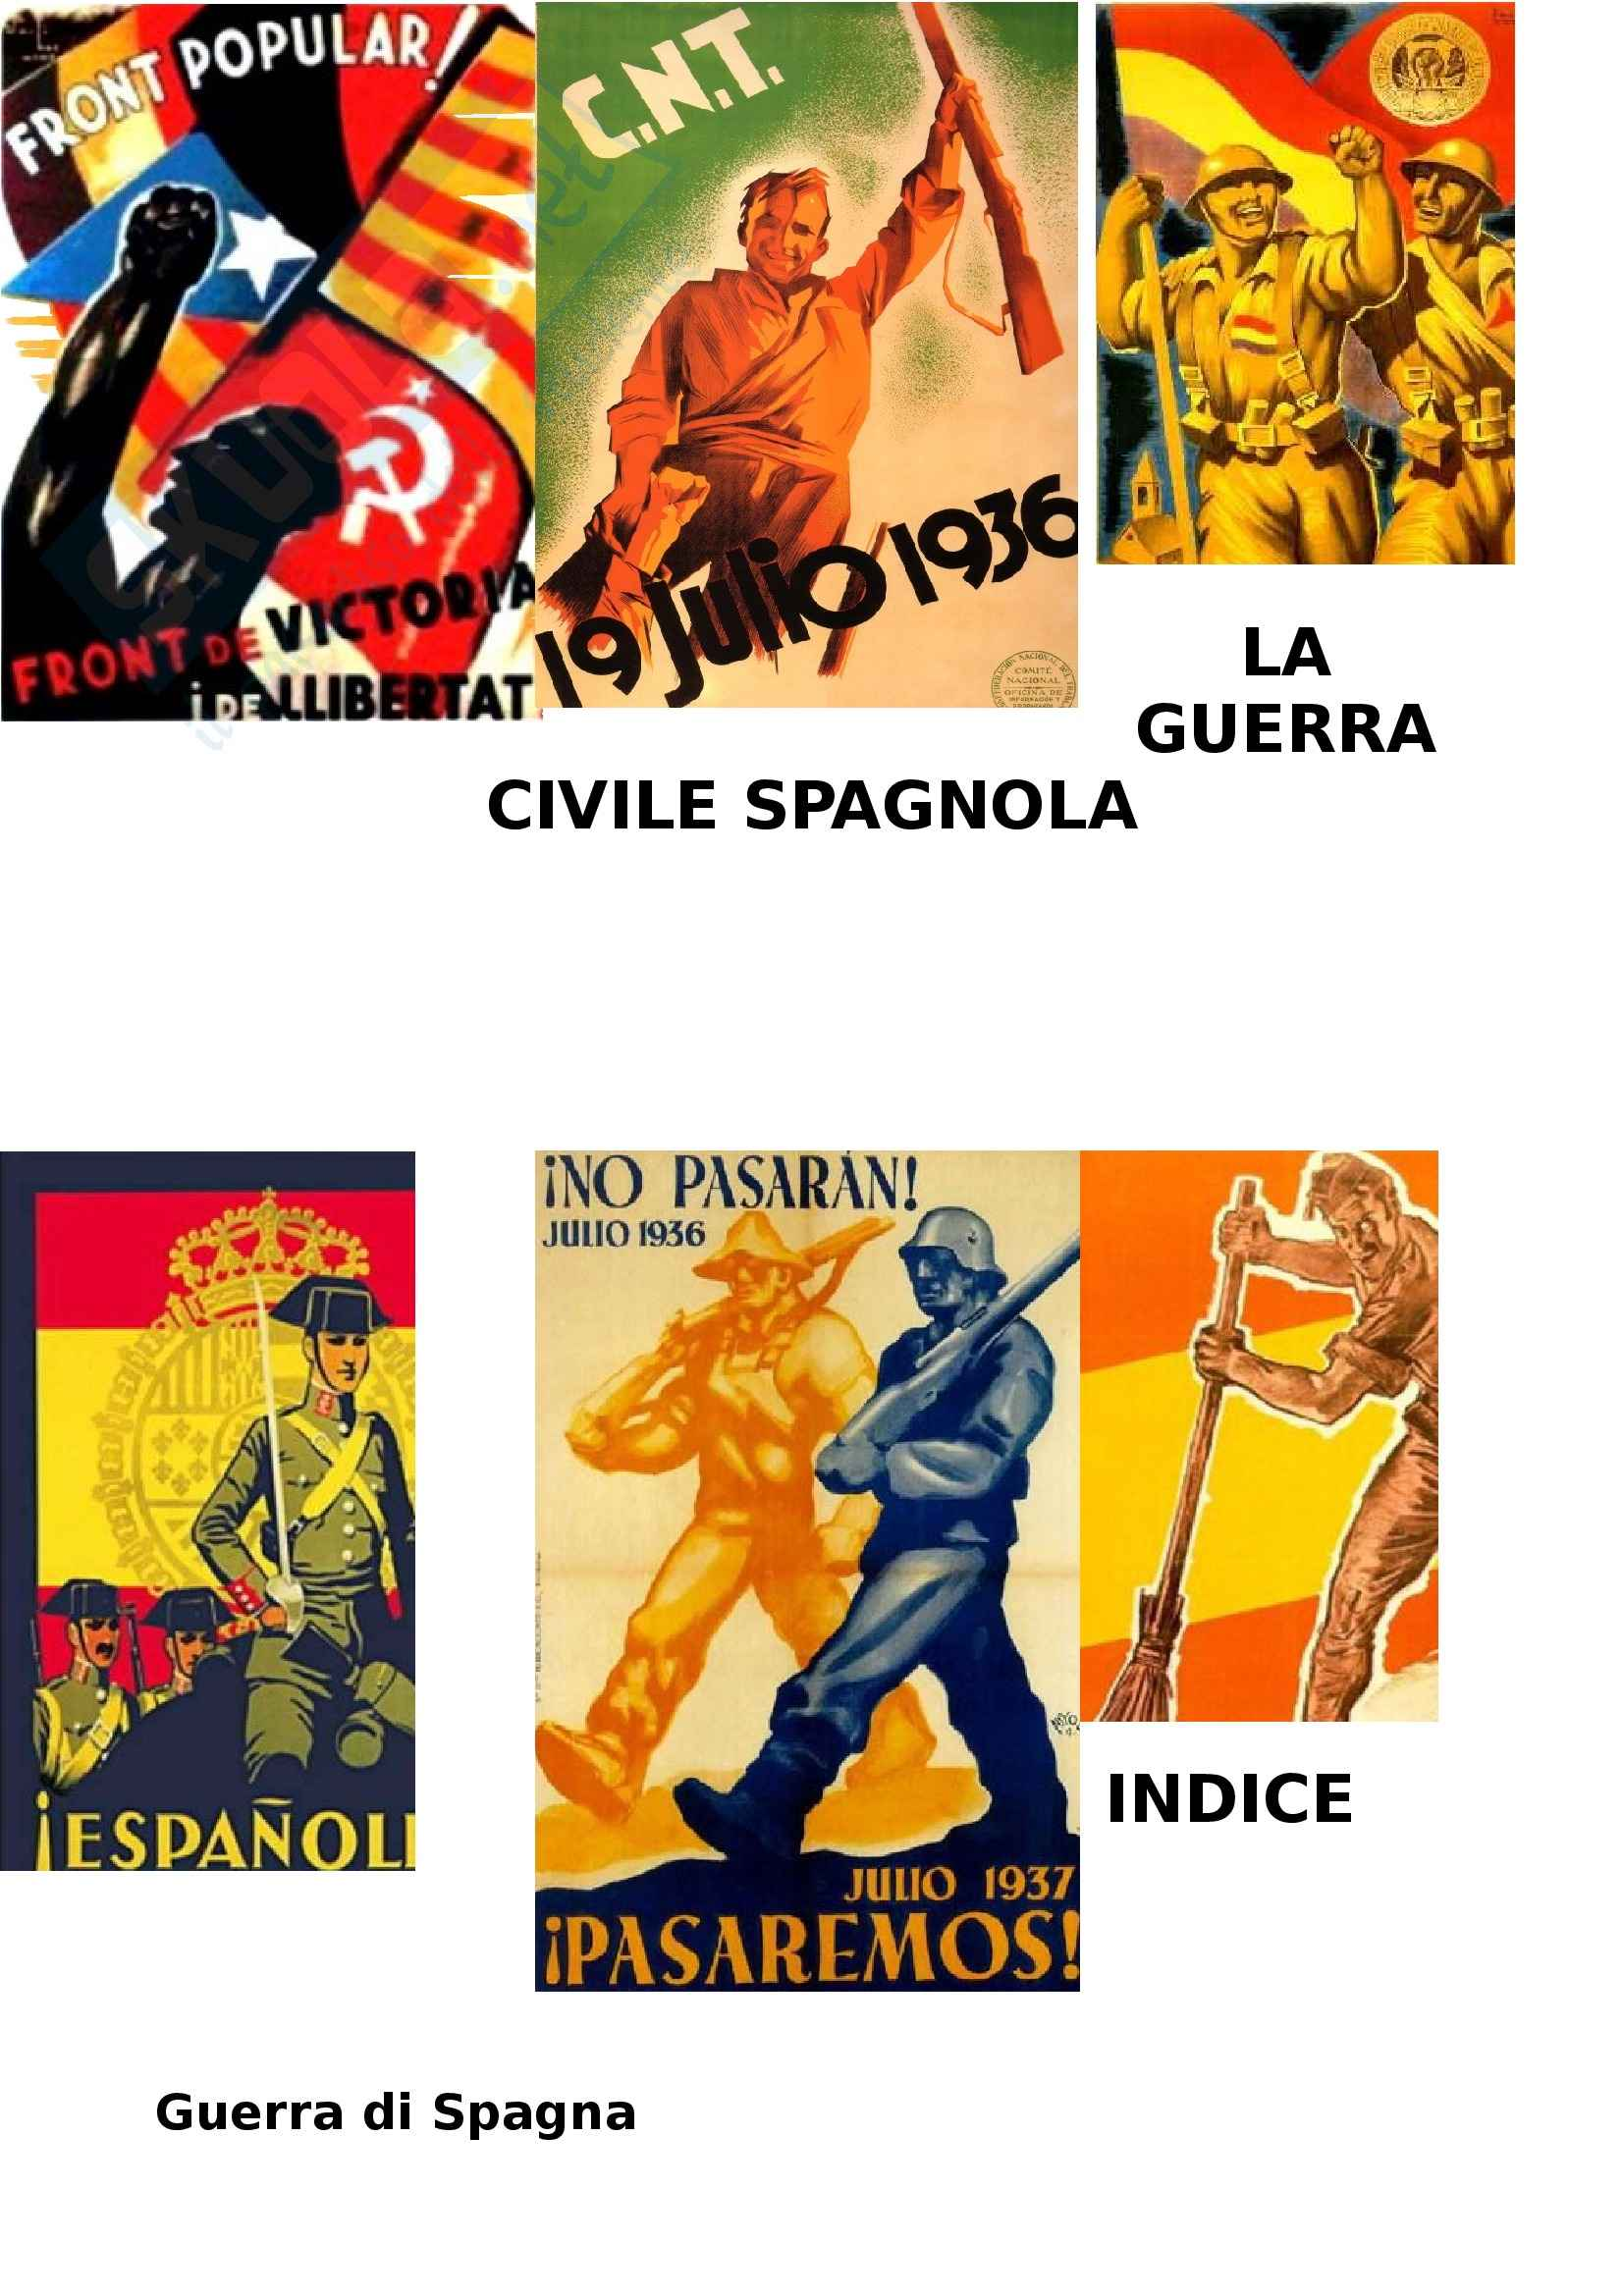 Guerra Civile Spagnola 1936-1939 Appunti, sunti, curiosità, prof. Saresella